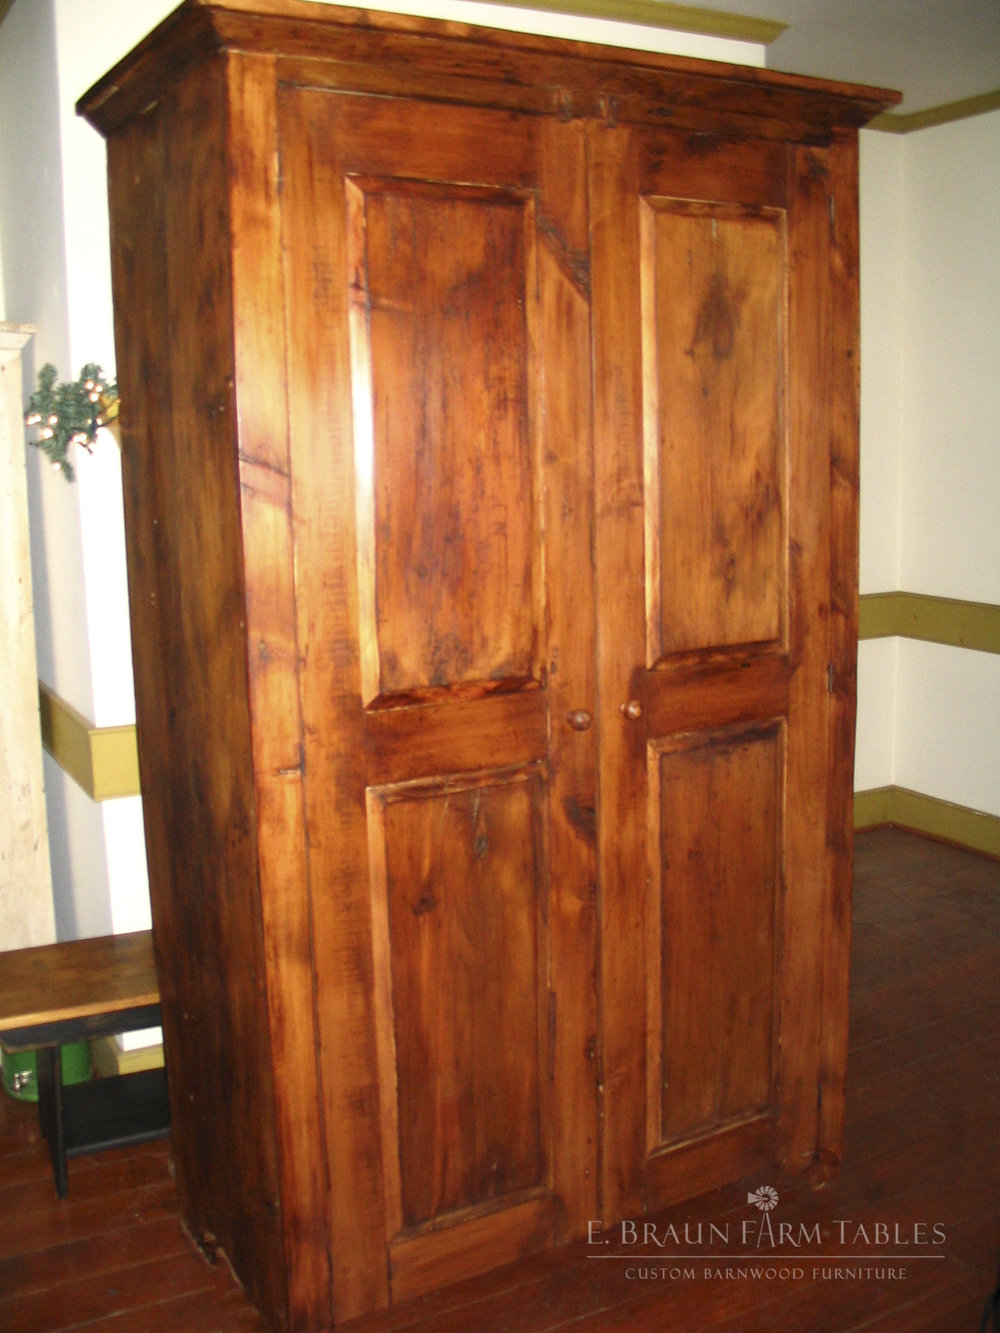 BR50 - Raised Panel Armoire/Wardrobe